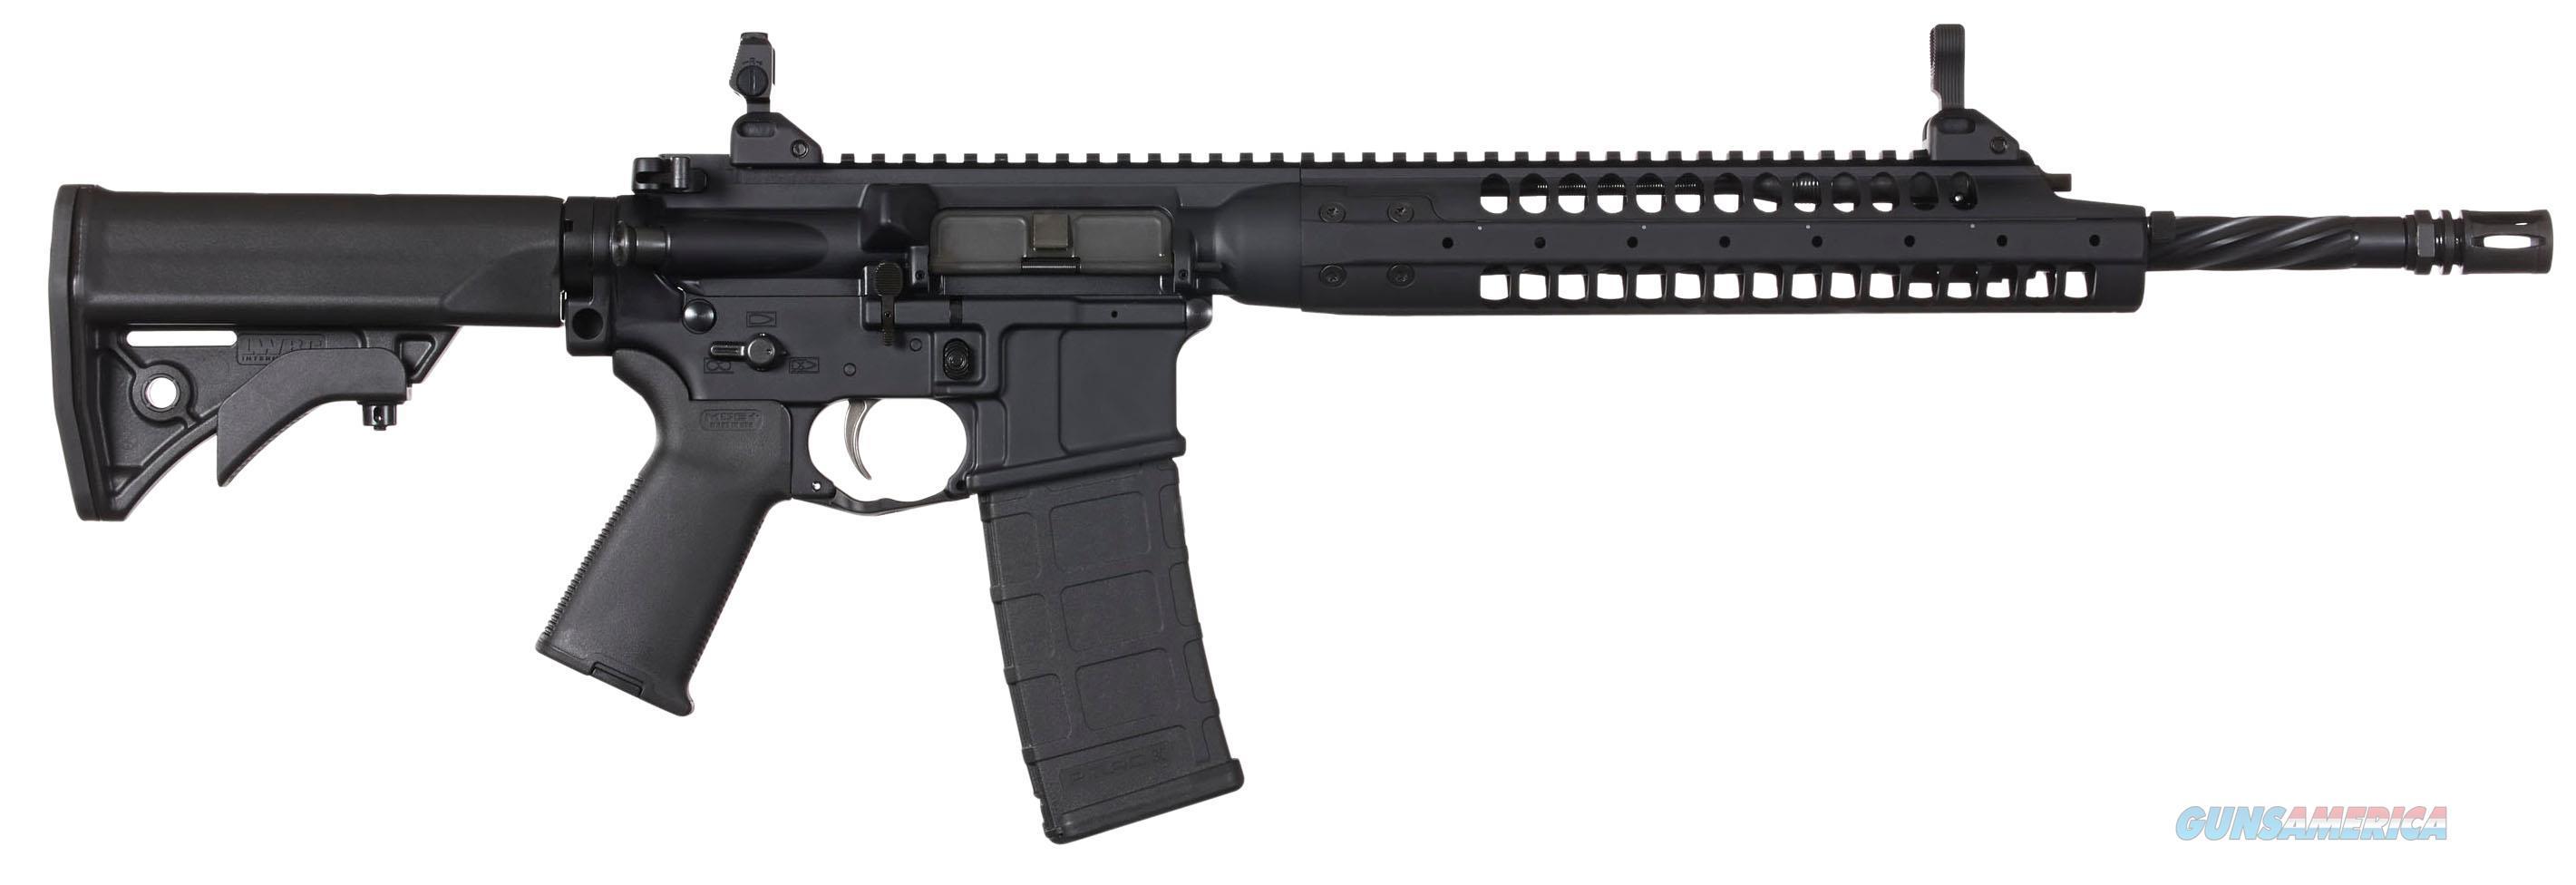 "Lwrc Ica5r5b16 Individual Carbine A5 Semi-Automatic 223 Remington/5.56 Nato 16.1"" 30+1 Adjustable Black Stk Black ICA5R5B16  Guns > Rifles > L Misc Rifles"